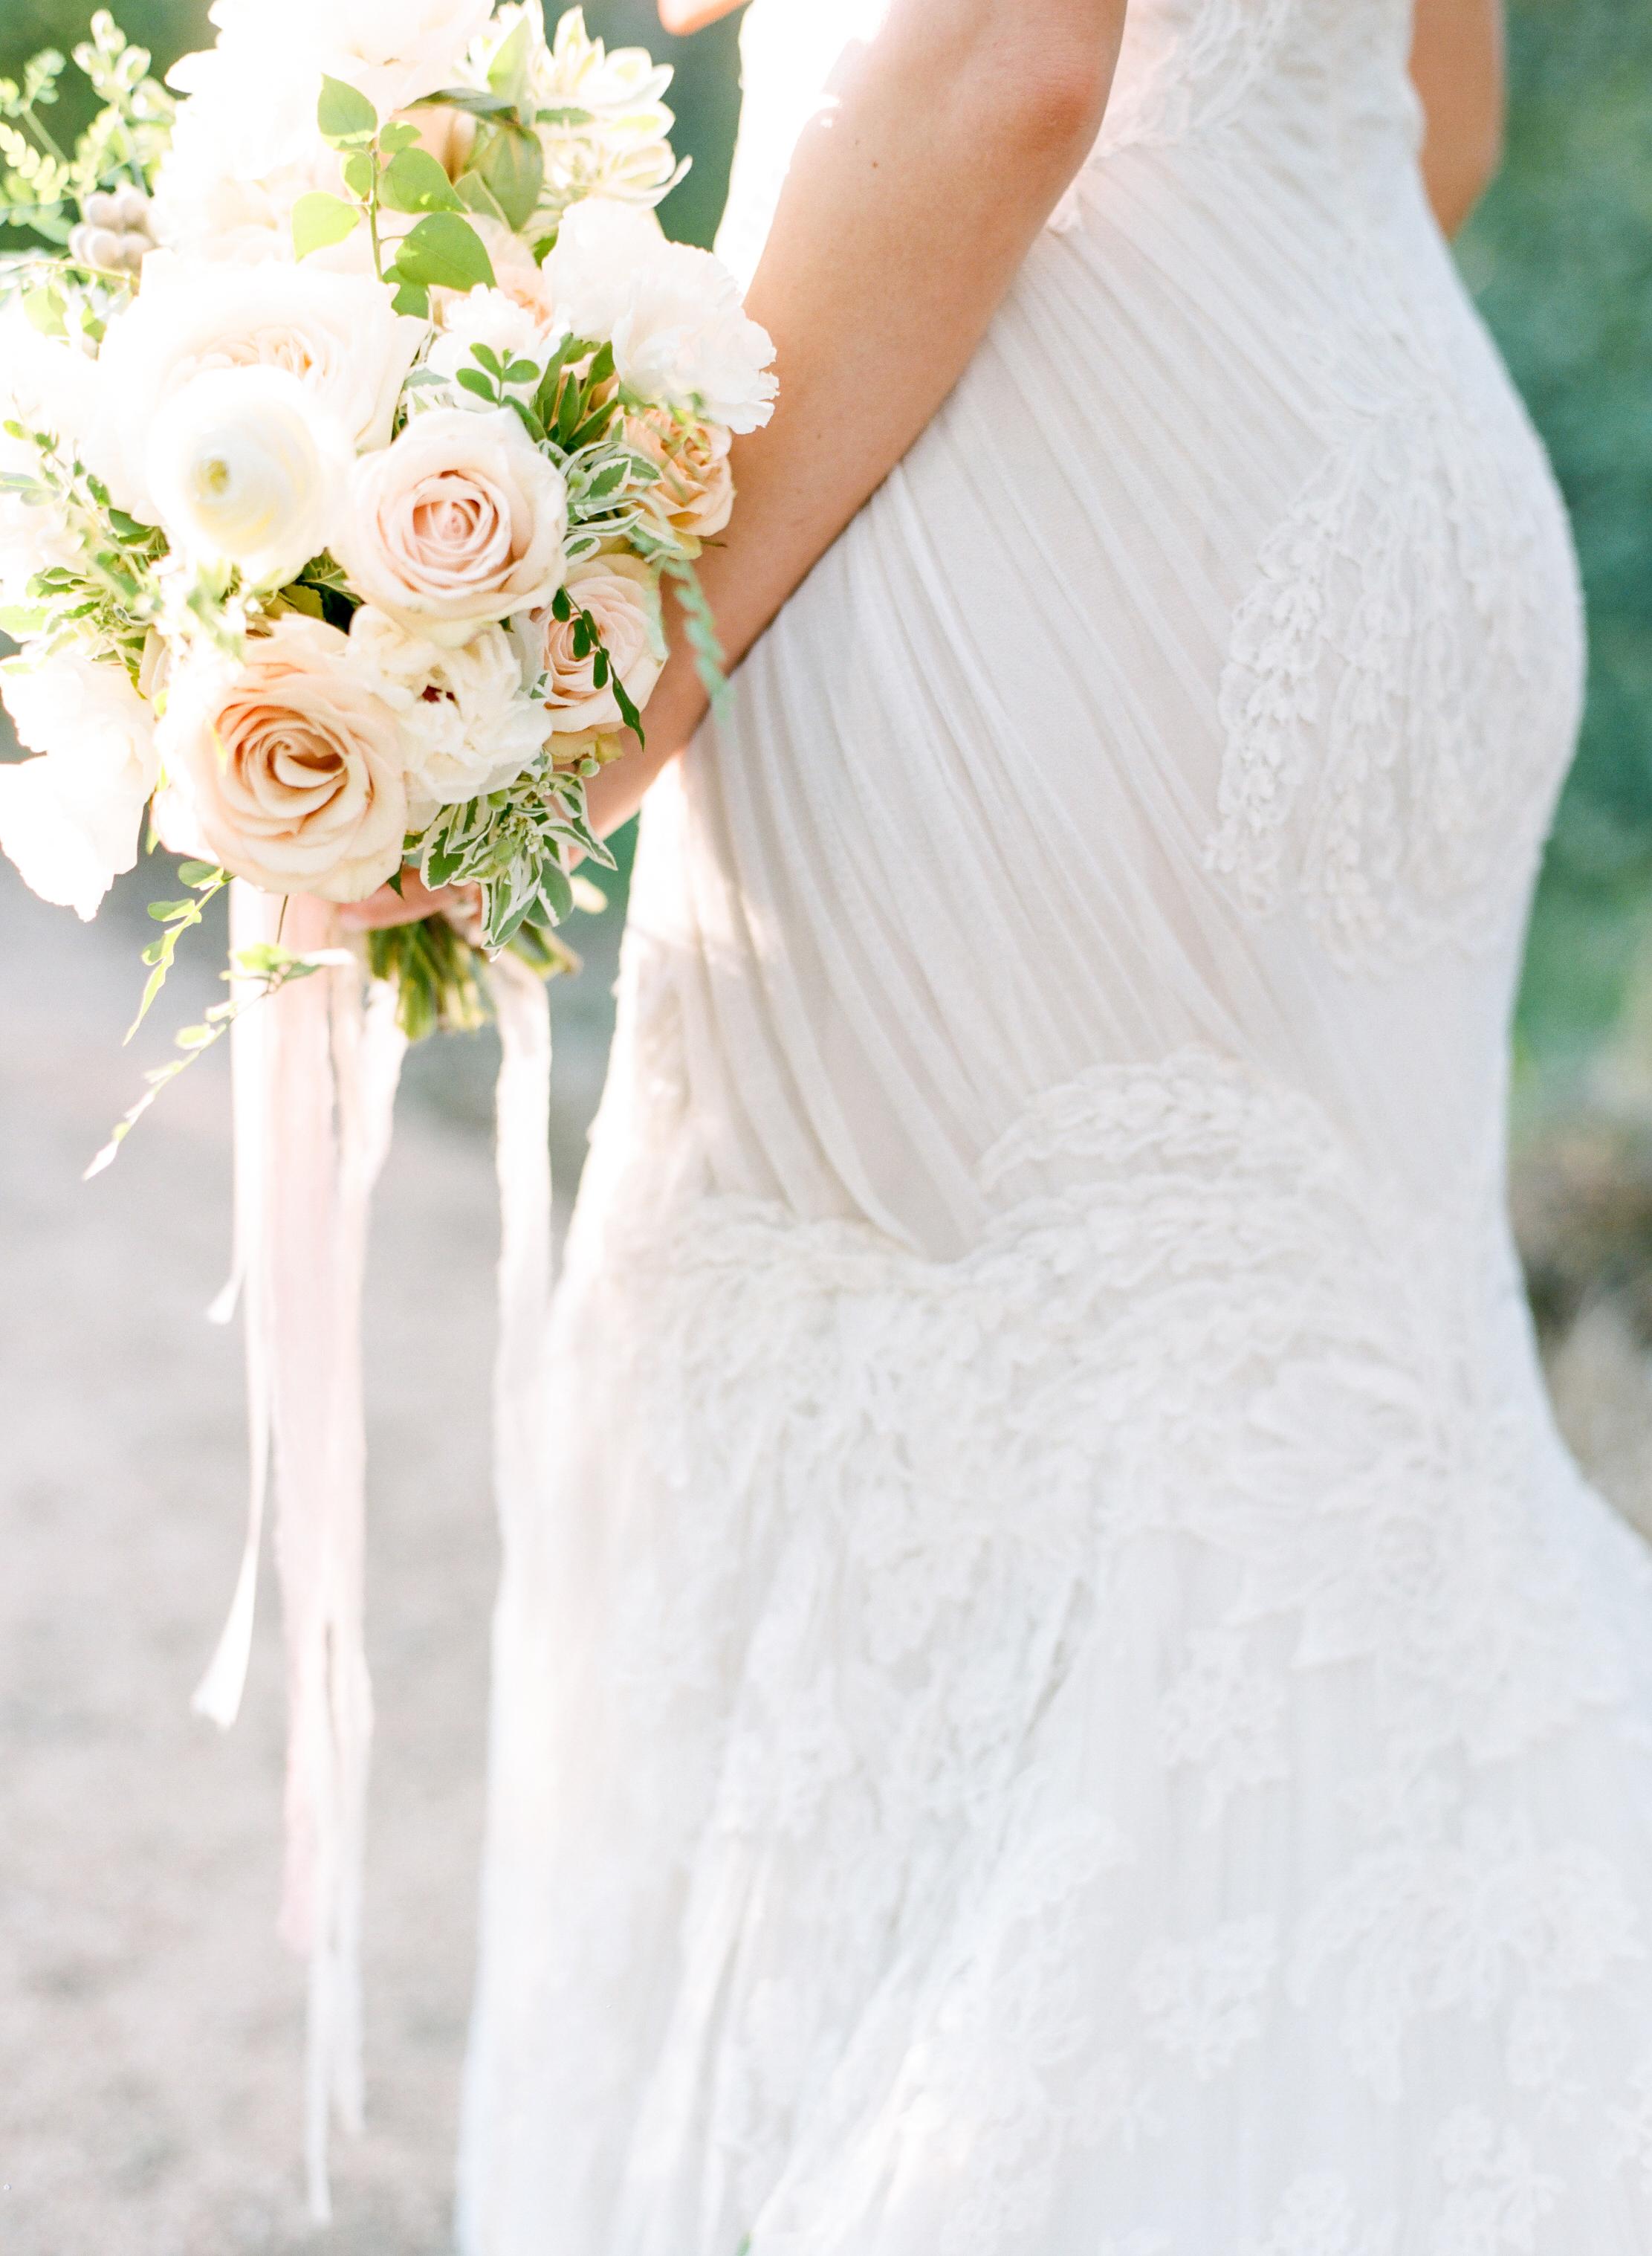 dana-fernandez-photography-the-wedding-chicks-film-houston-wedding-photography-destination-12.jpg